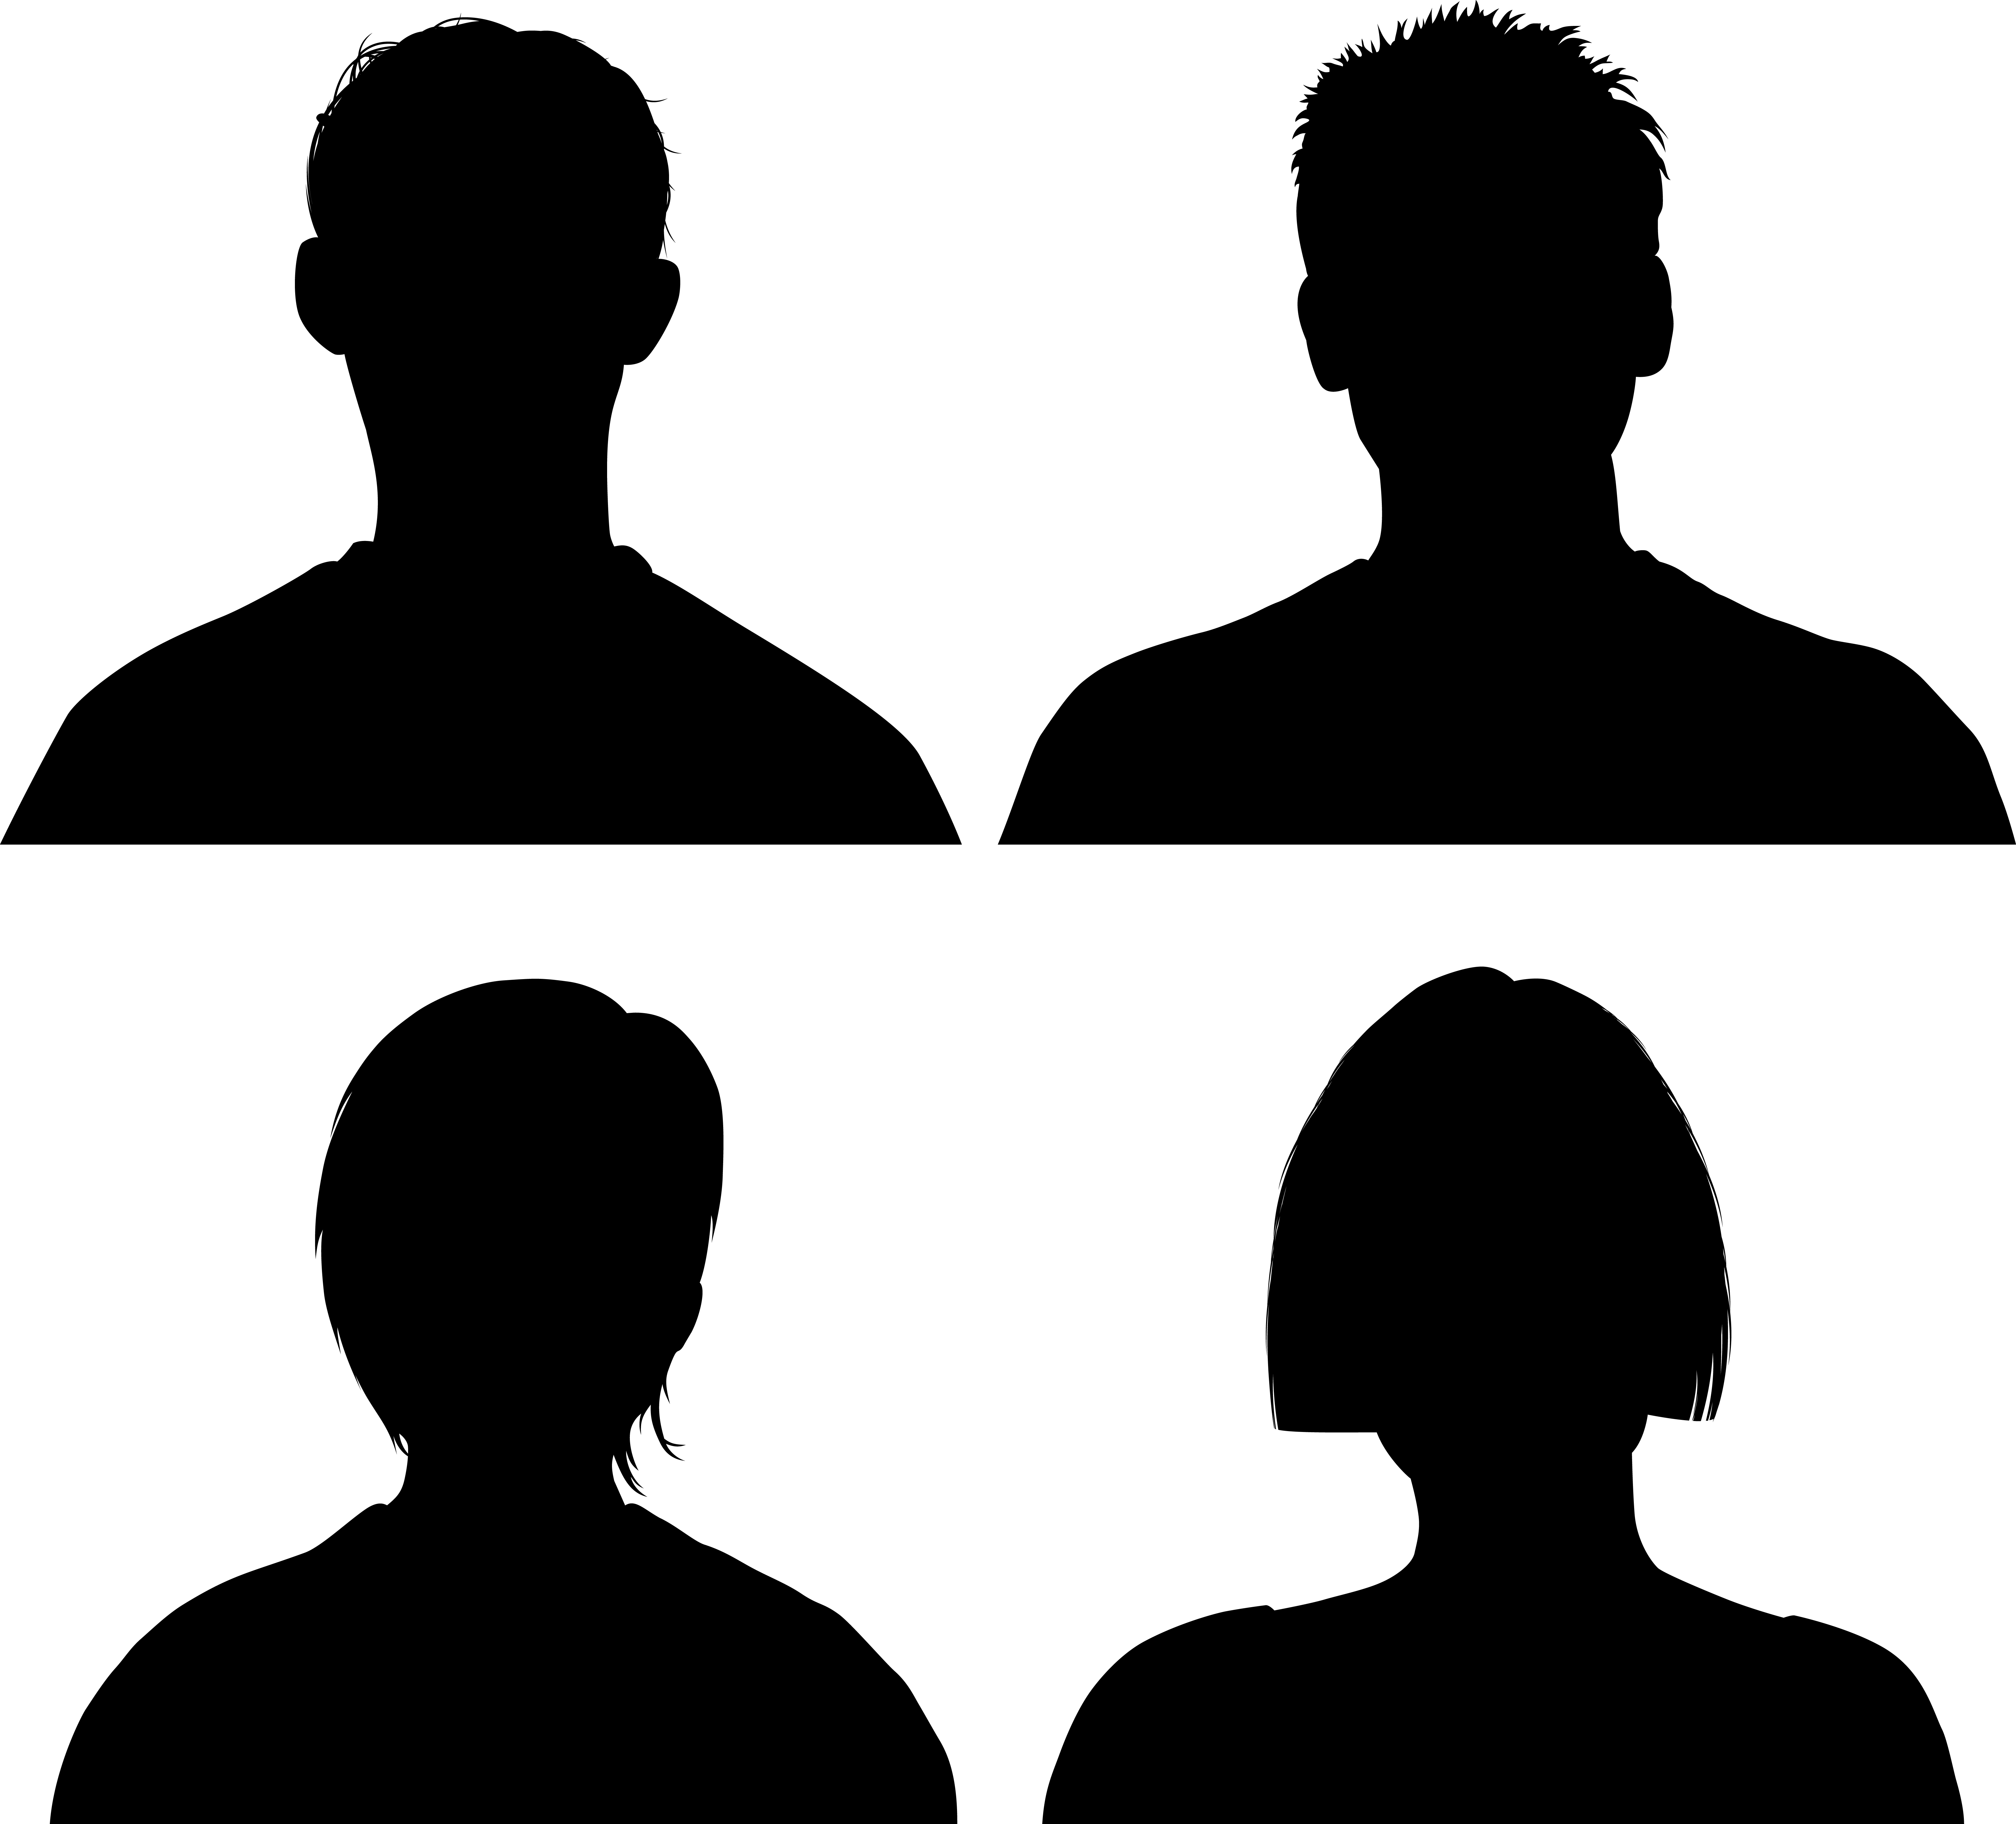 Silhouette Heads.